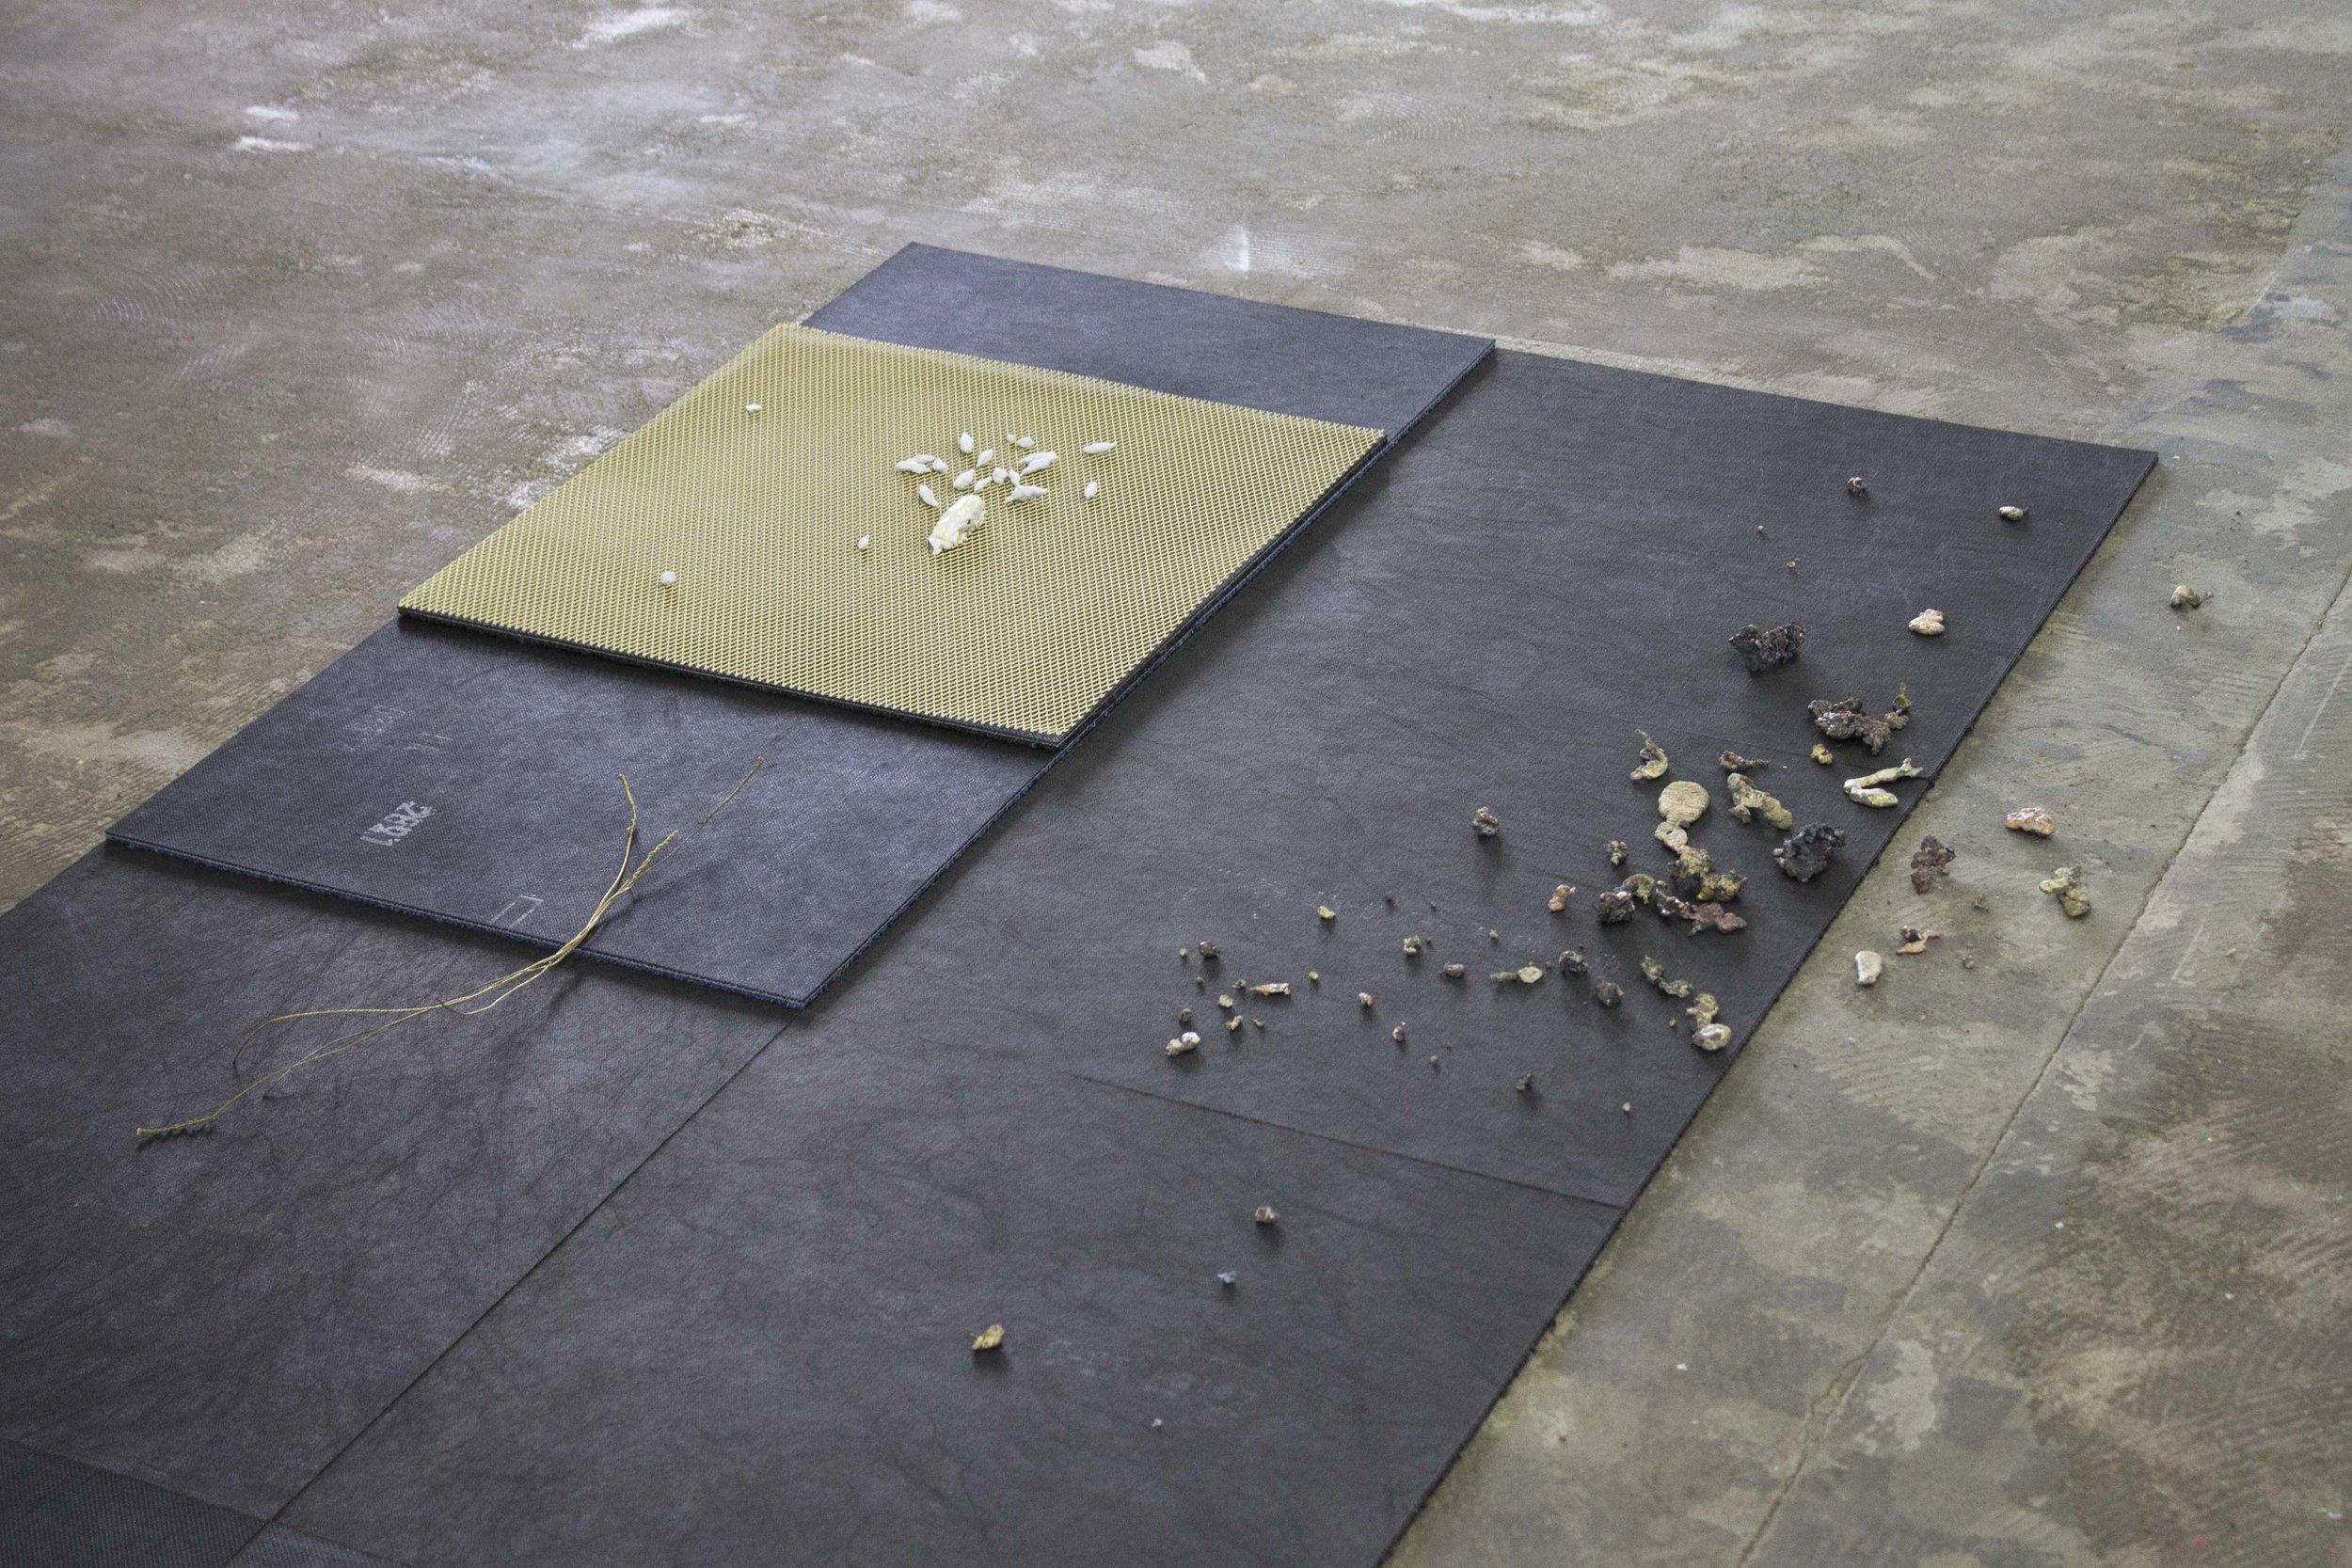 PVC Pain  – c arpet tiles, molten brass, molten copper, molten zinc, plastic, pigment, paper, brass string, brass grid 300 x 100 x 5 cm, 2015